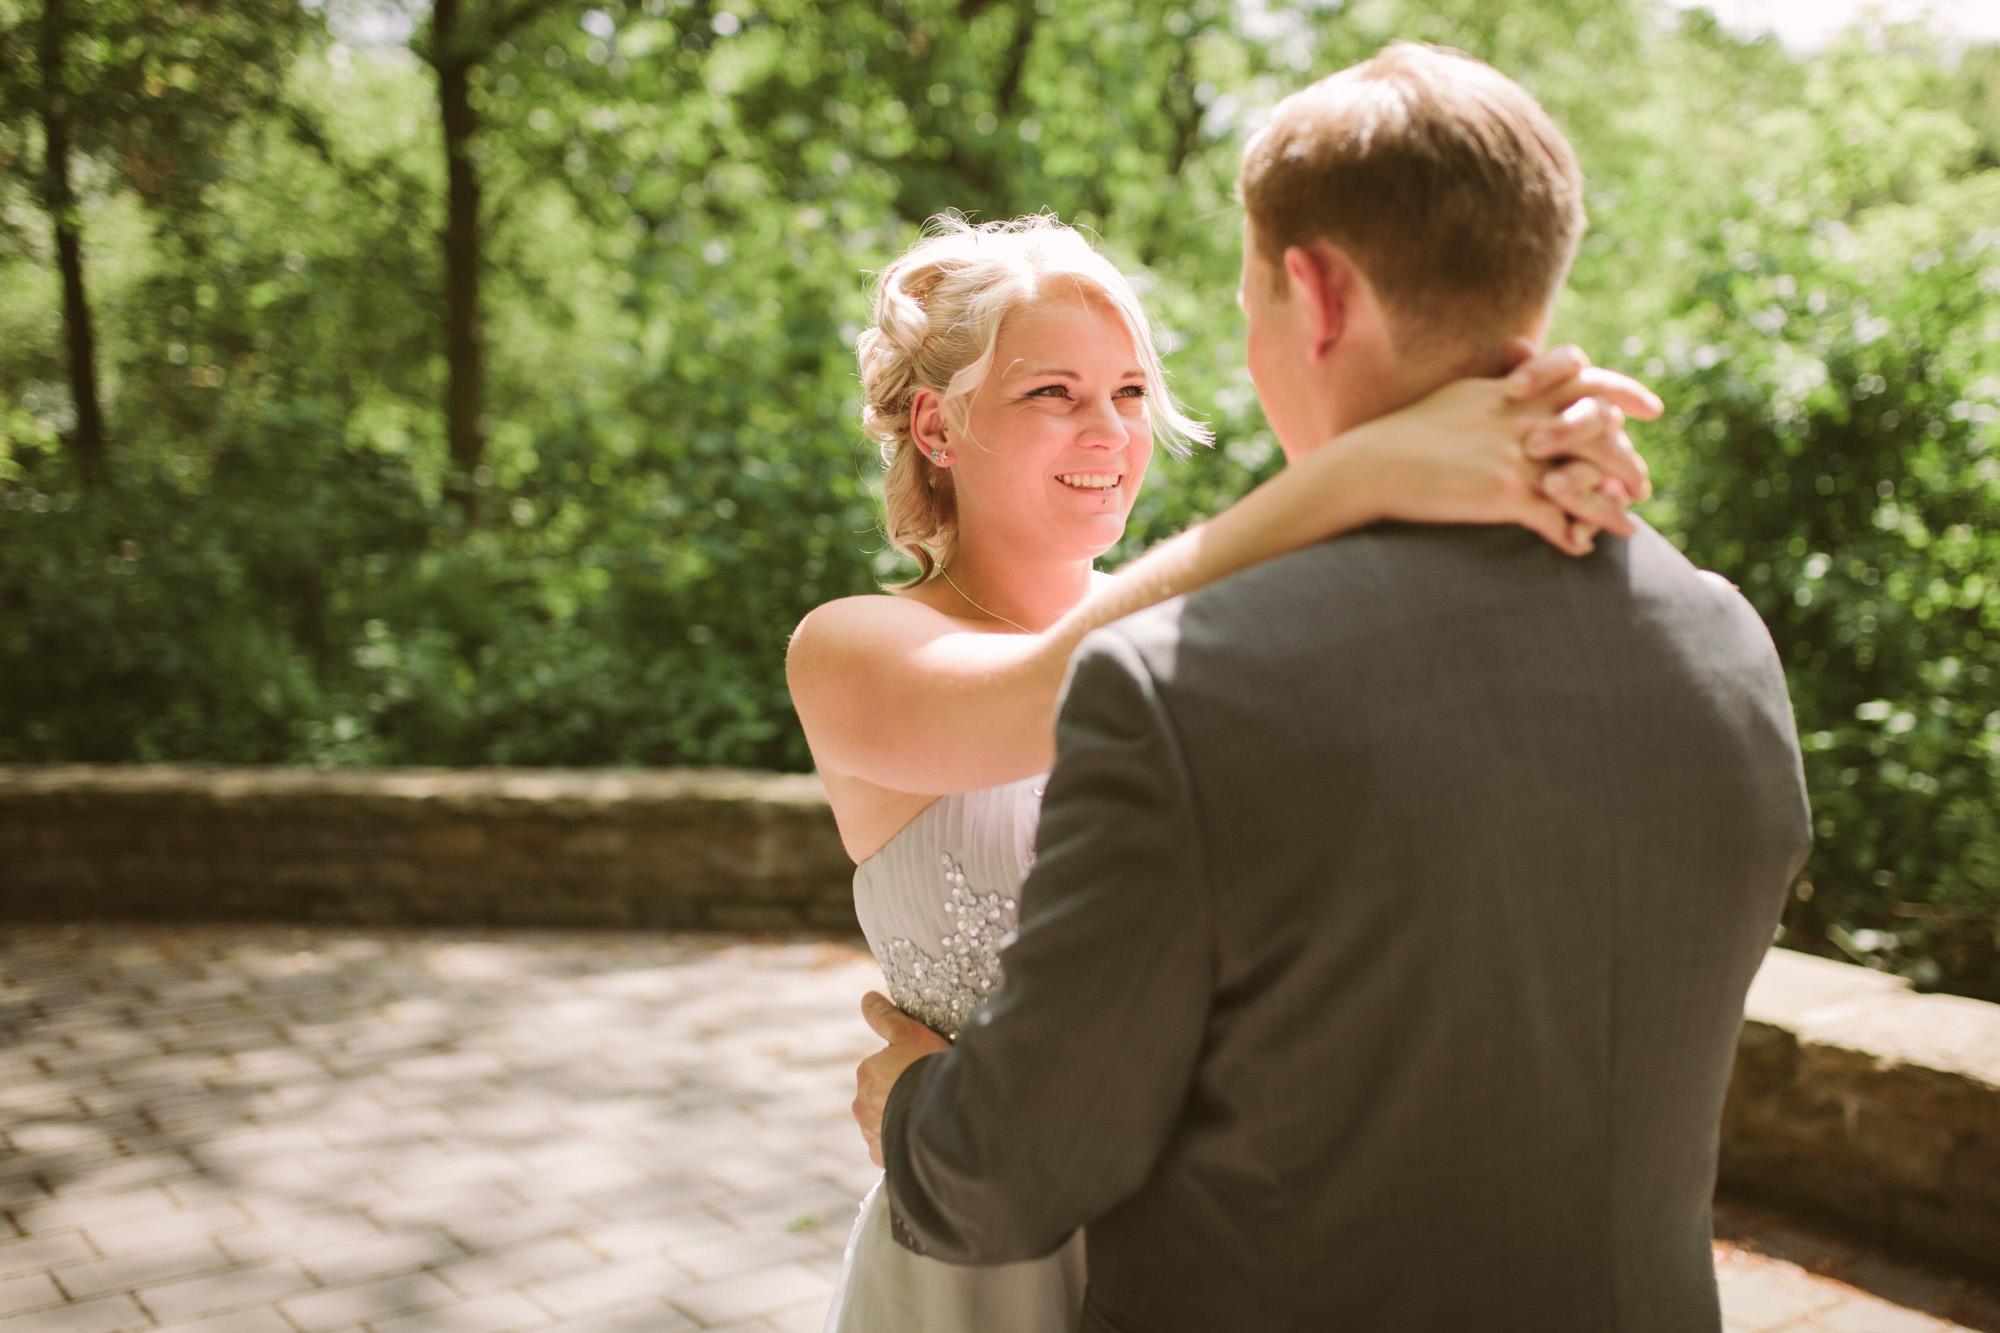 Claudia-Krawinkel-Hochzeitsfotografie-Essen-Duisburg-Standesamt-Schloss-Borbeck-53